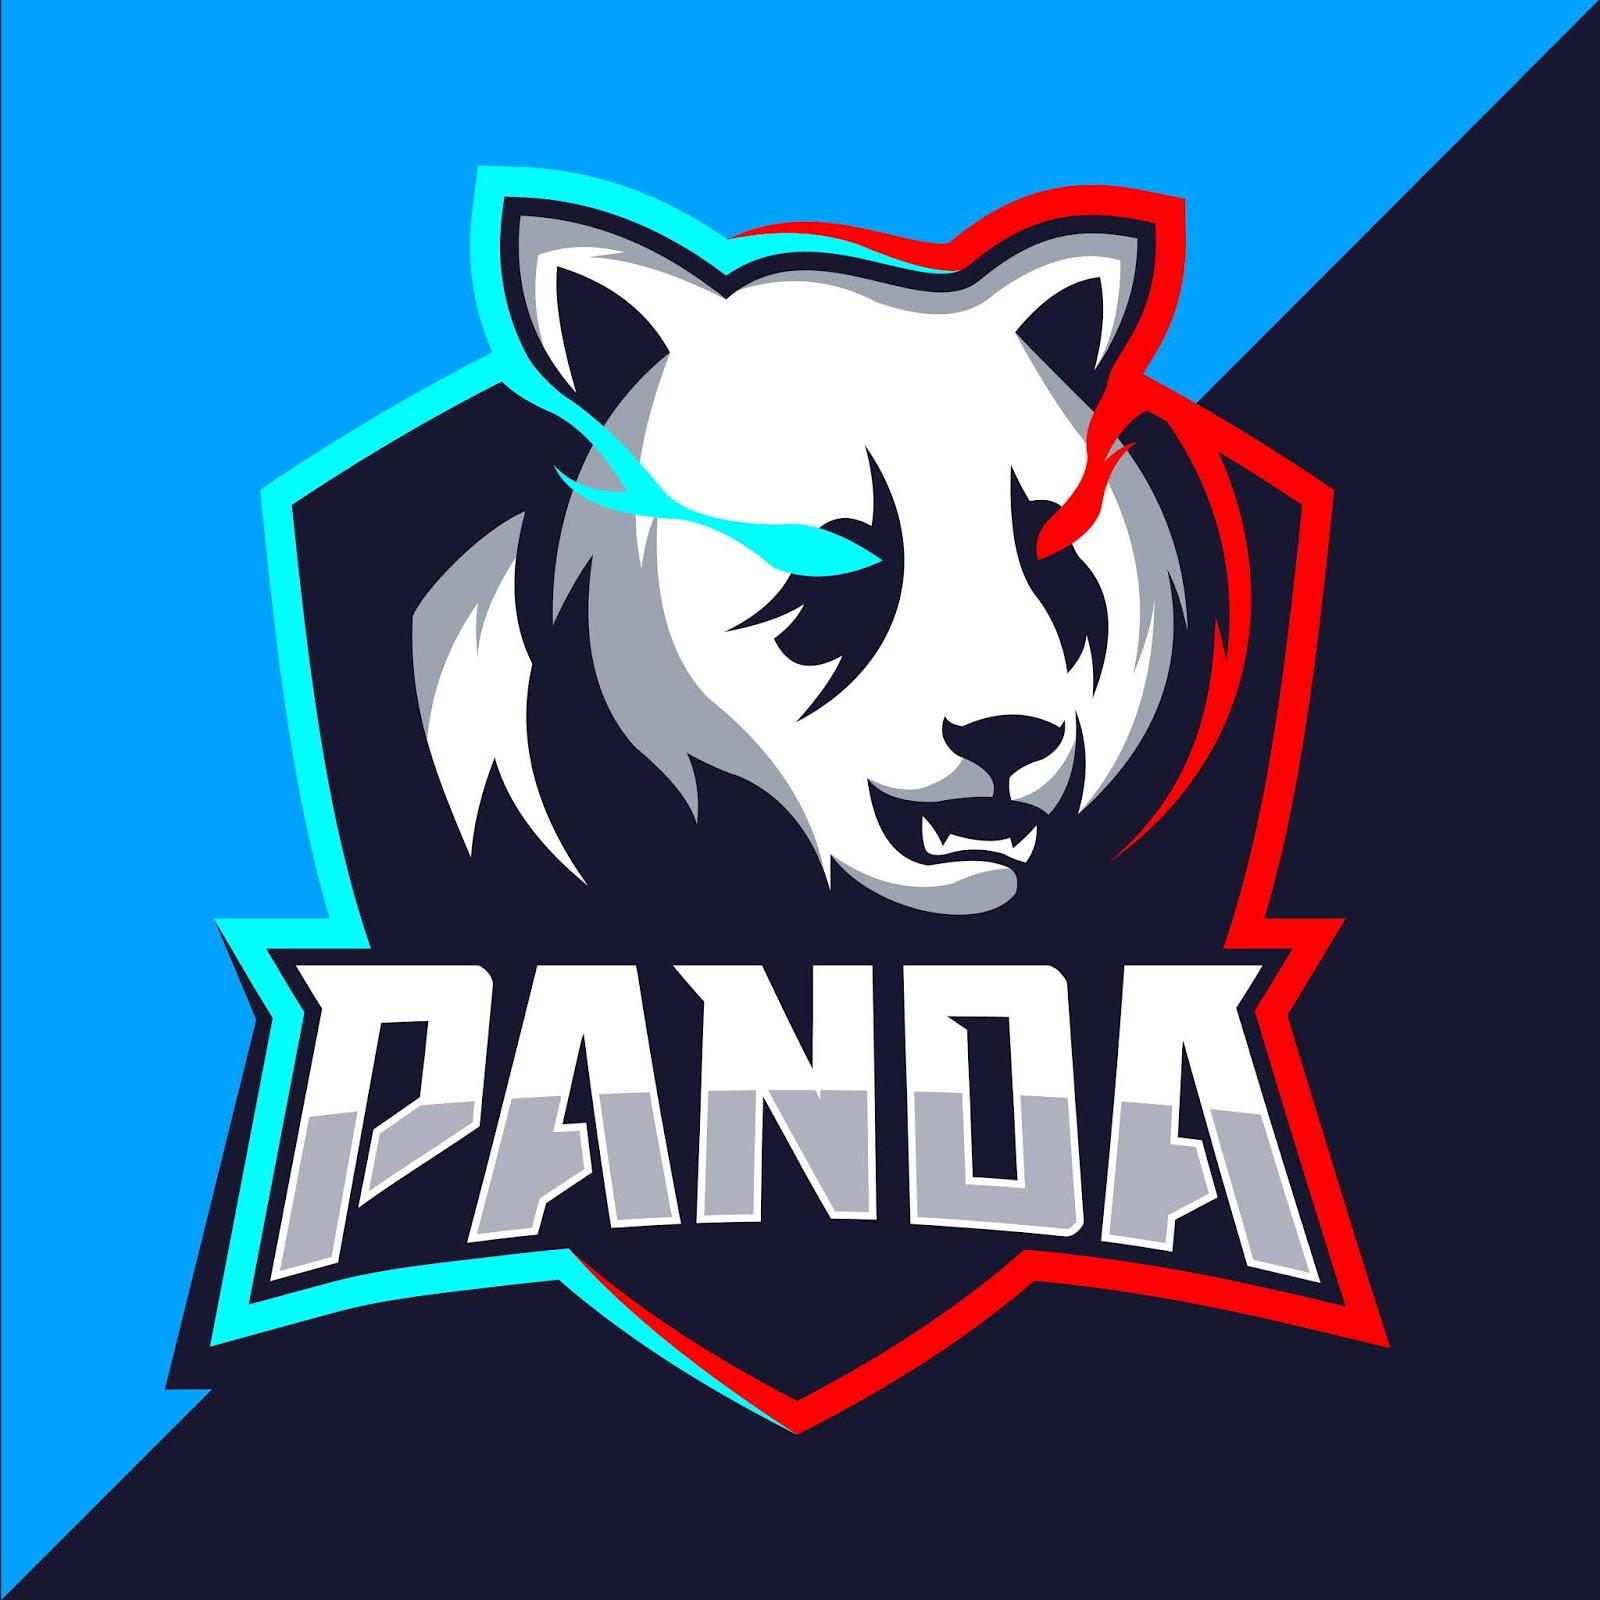 Panda Mascot Esport Logo Free Download Vector CDR, AI, EPS and PNG Formats